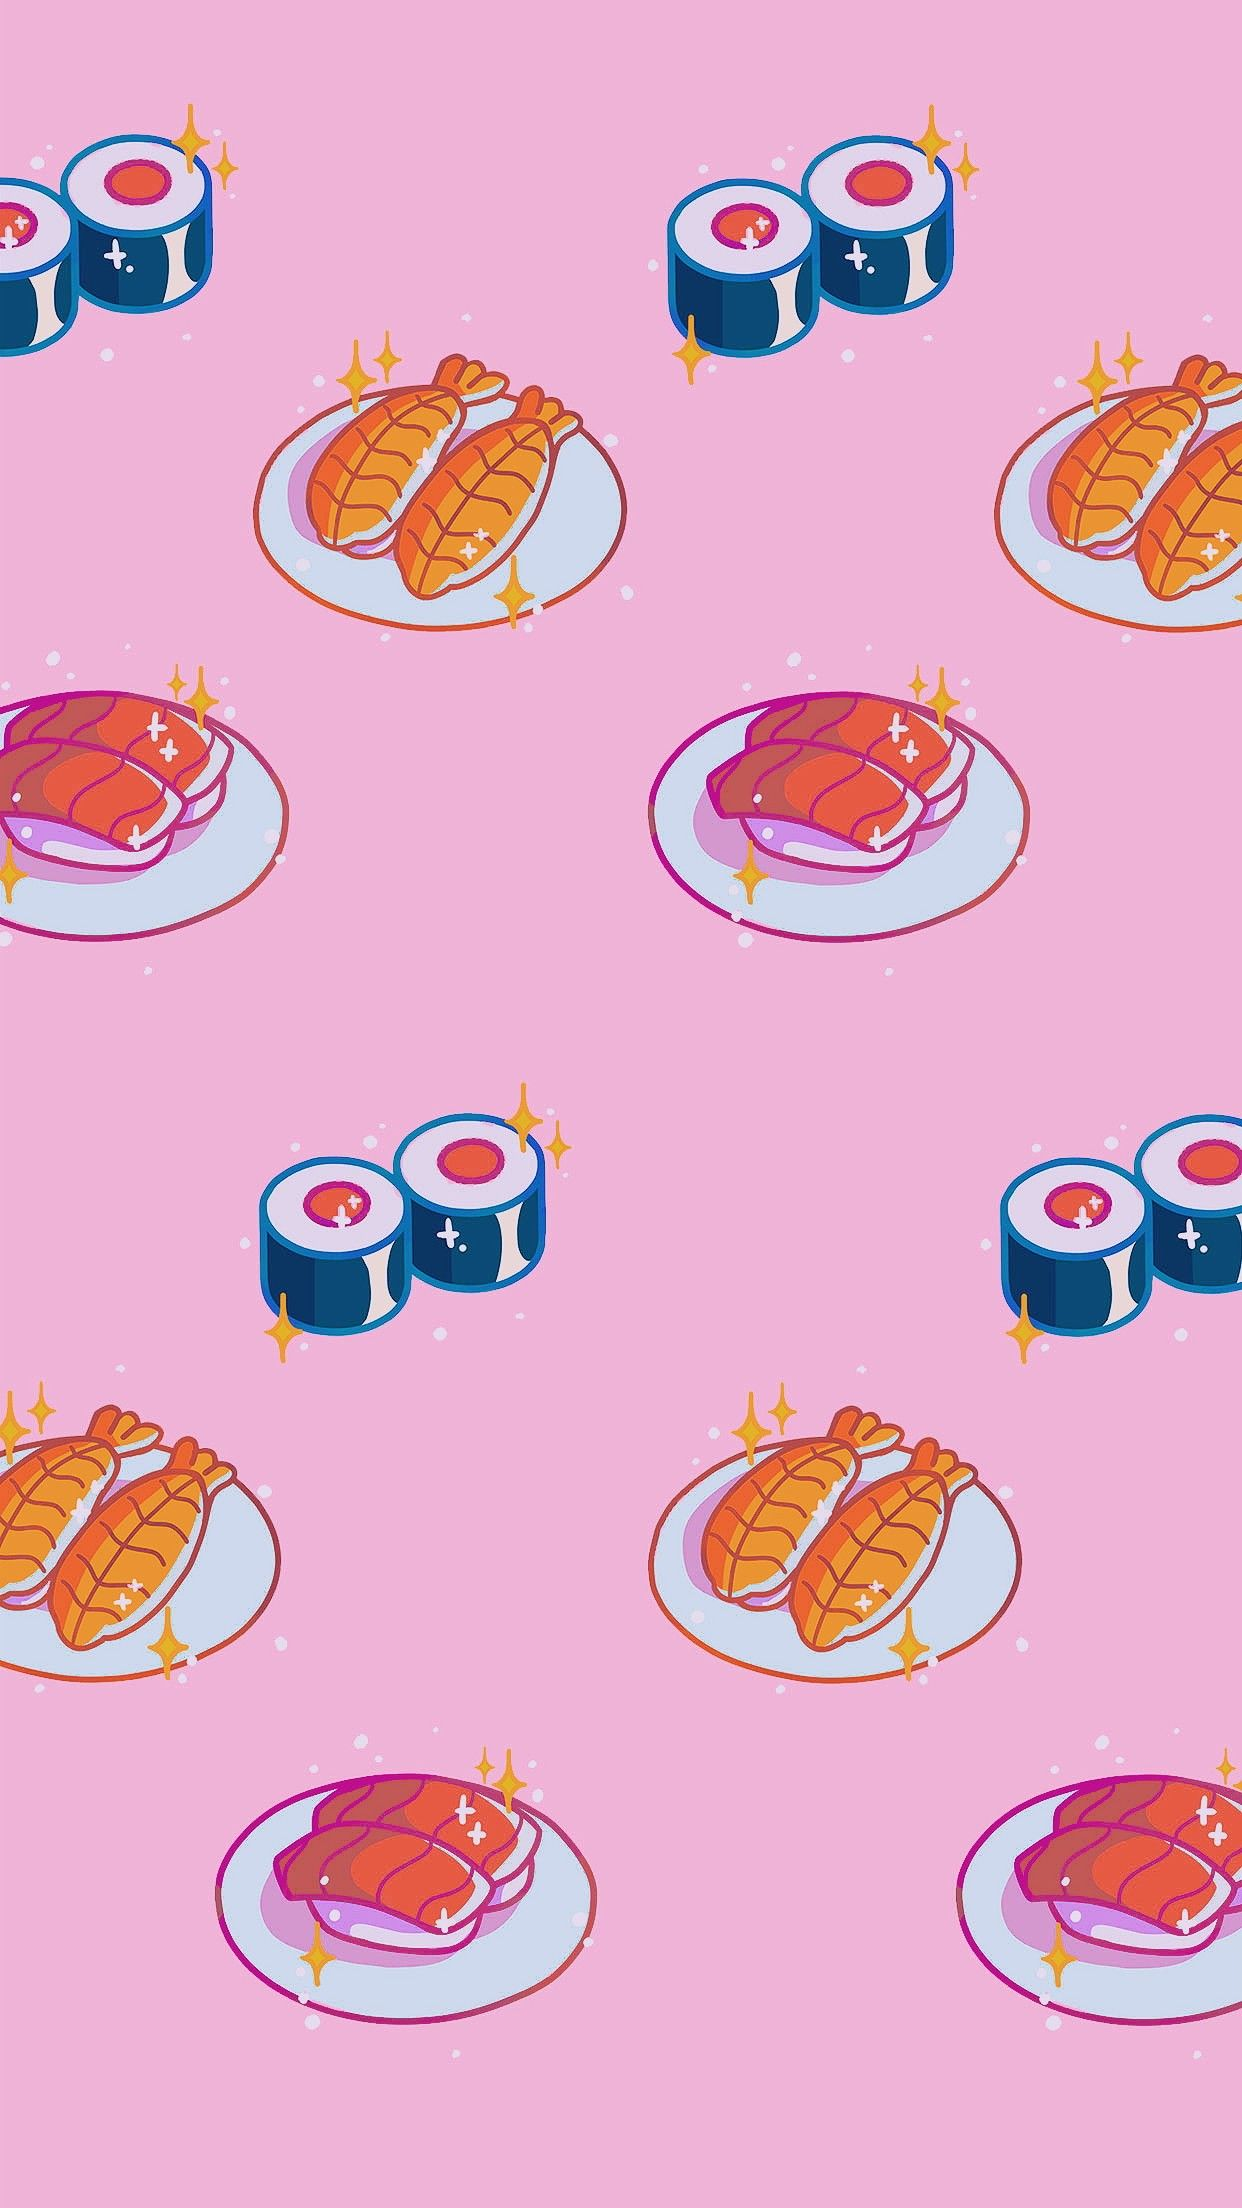 Lordkndy Japanese Wallpaper Iphone Cute Food Wallpaper Anime Wallpaper Iphone